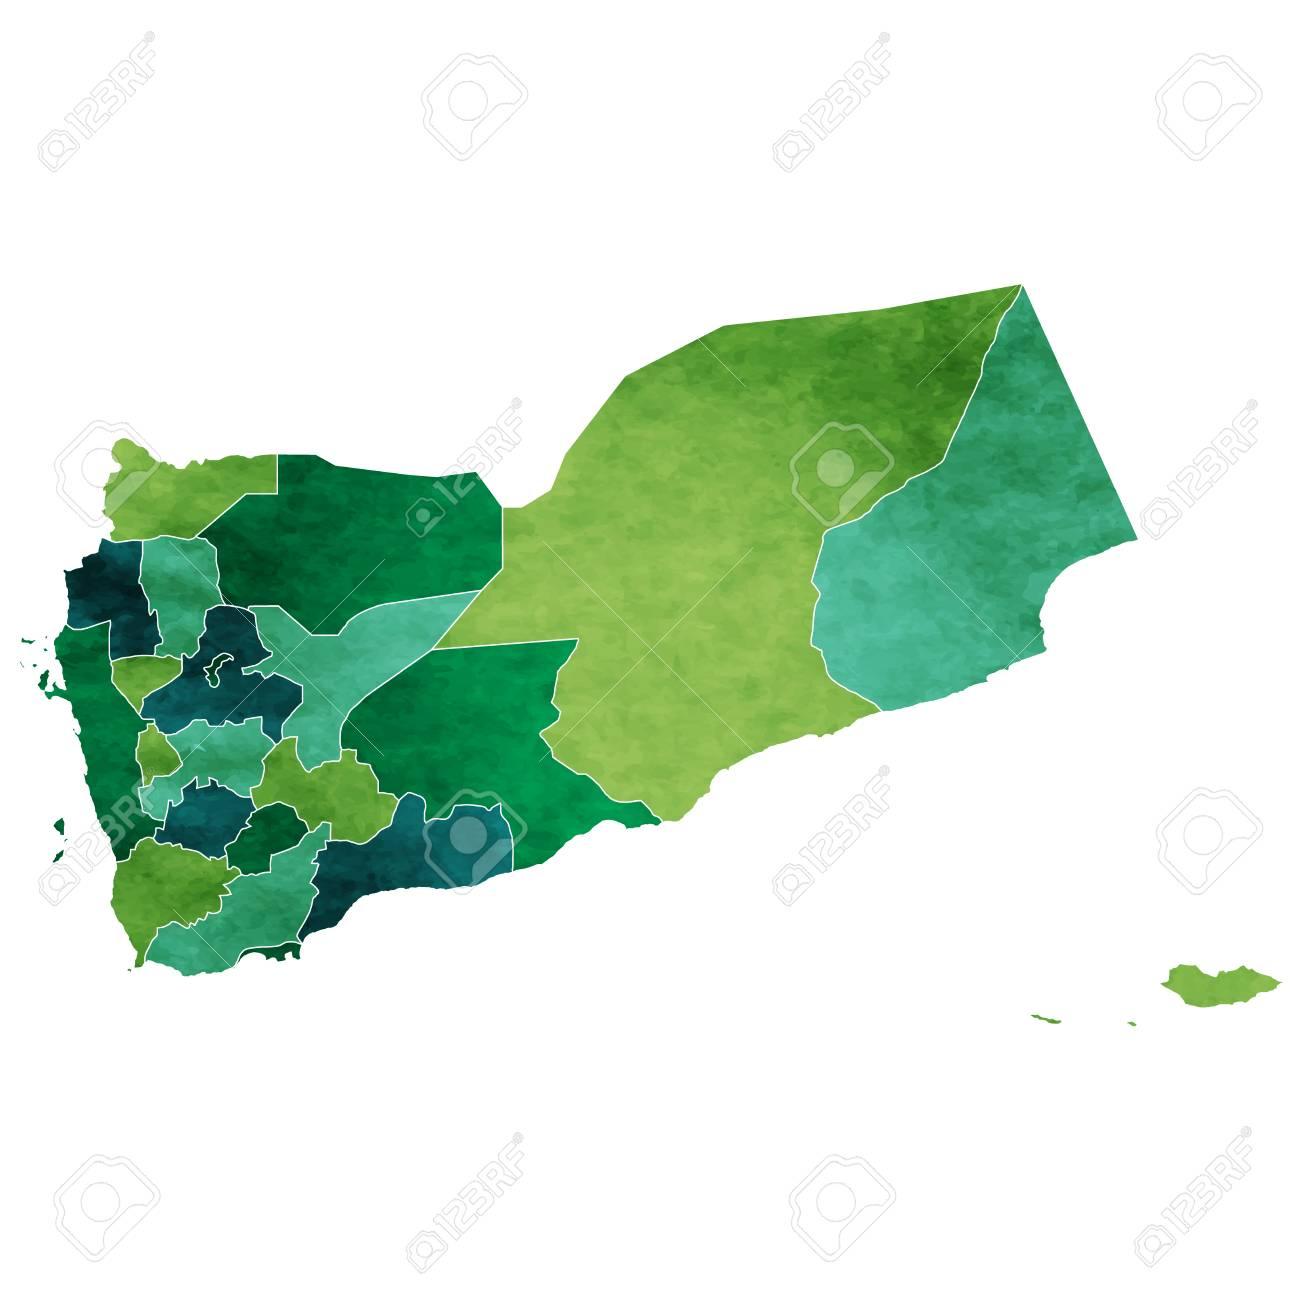 Yemen World map country icon.